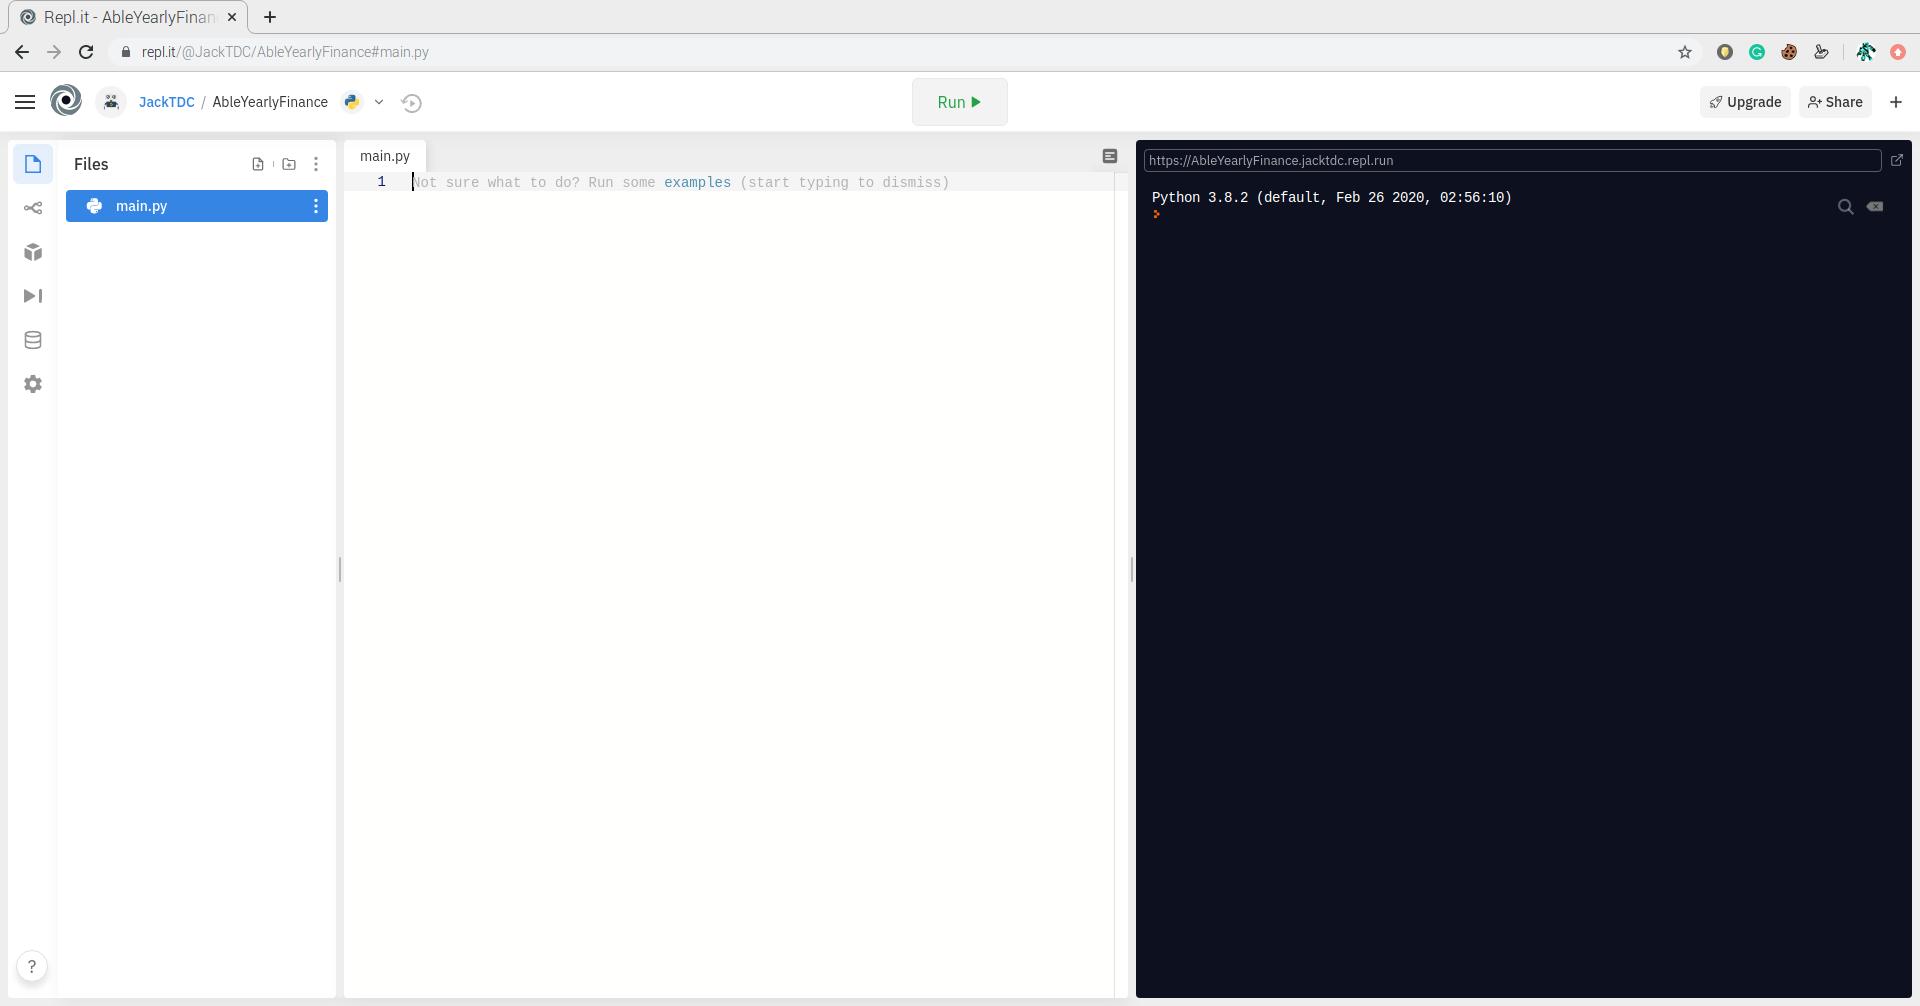 main.py file in Repl.it